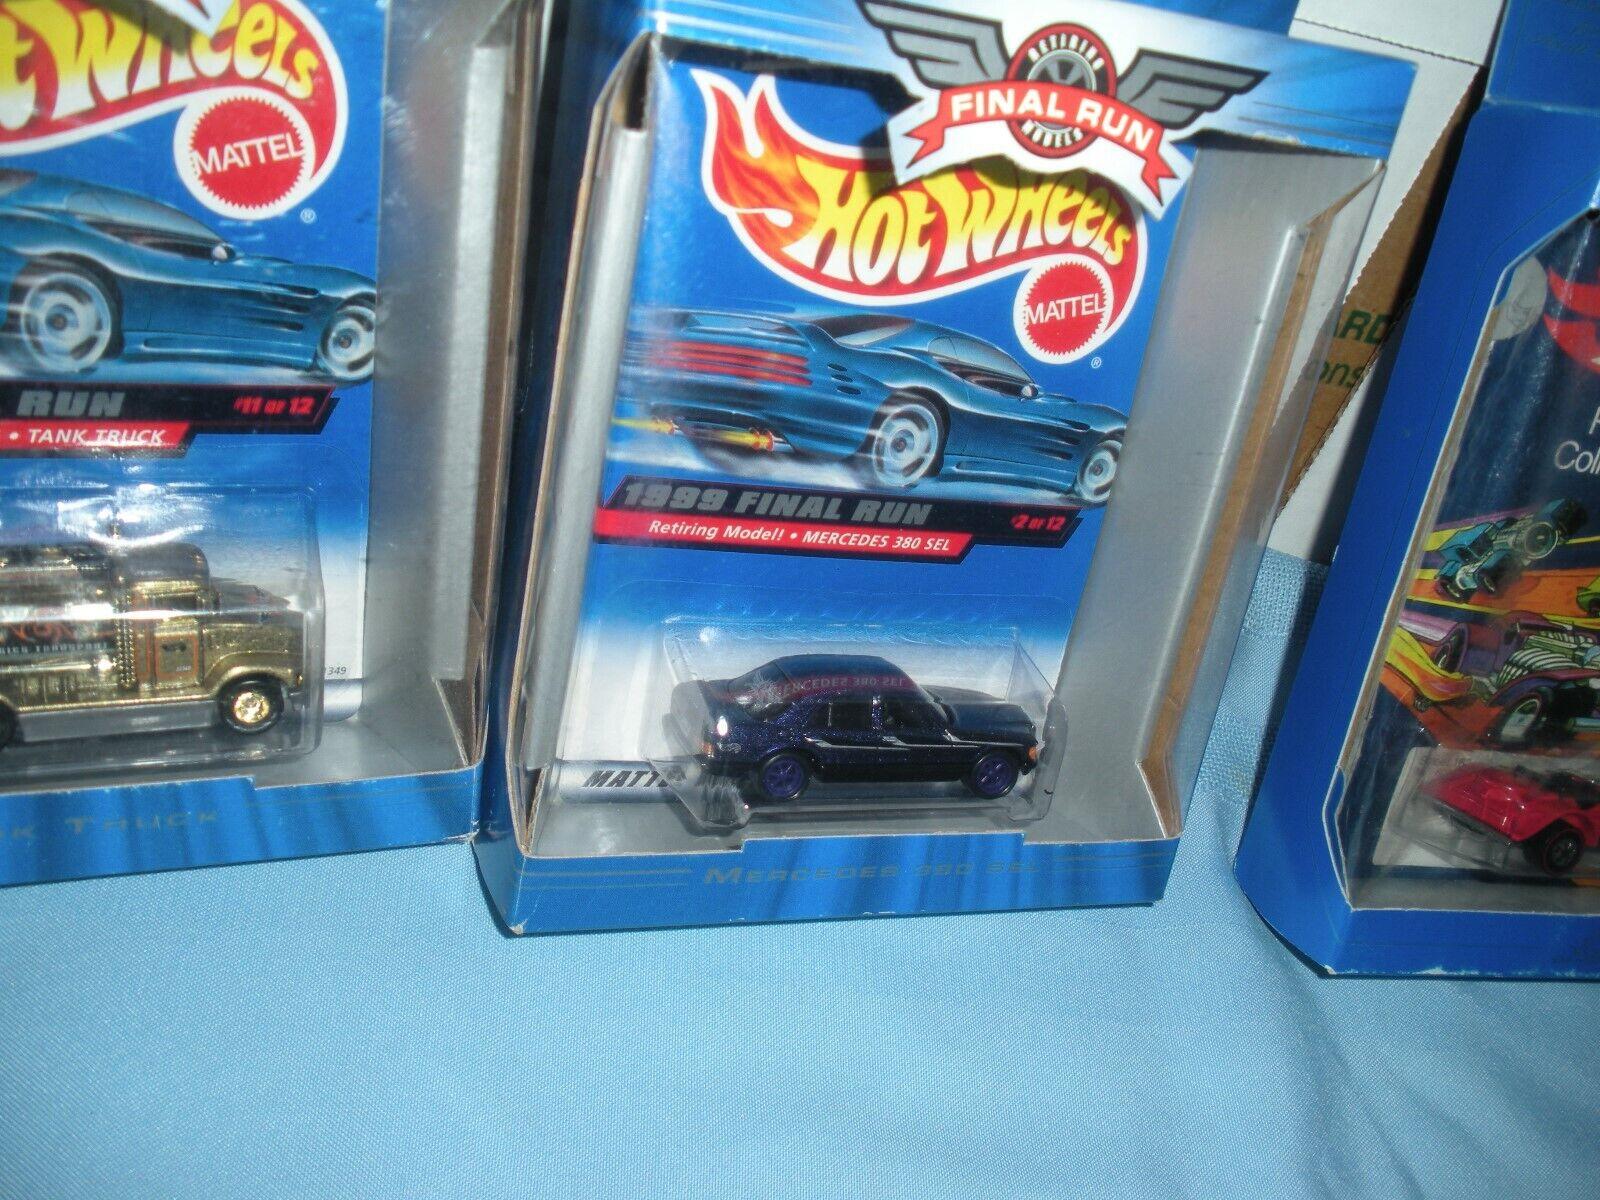 Hot Wheels 1973 Commemorative Replica Sweet Sweet Sweet 16 Final Run Mercedes 380 Sel + 1 669362